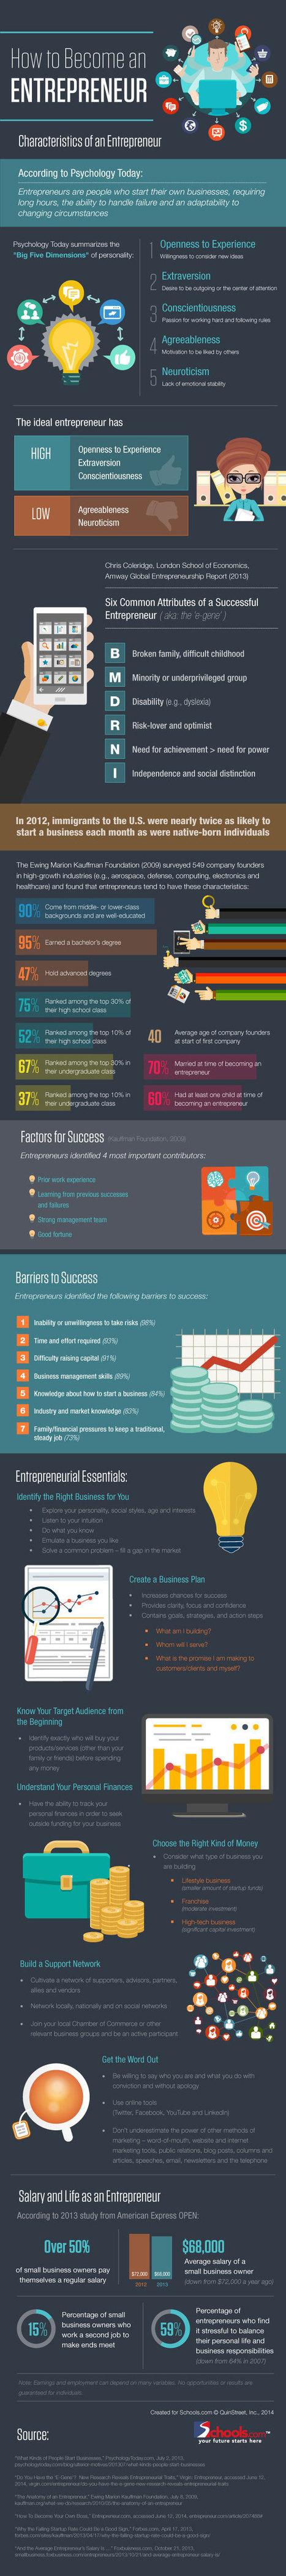 How to Become an Entrepreneur | Social Media & Entrepreneurship | Scoop.it